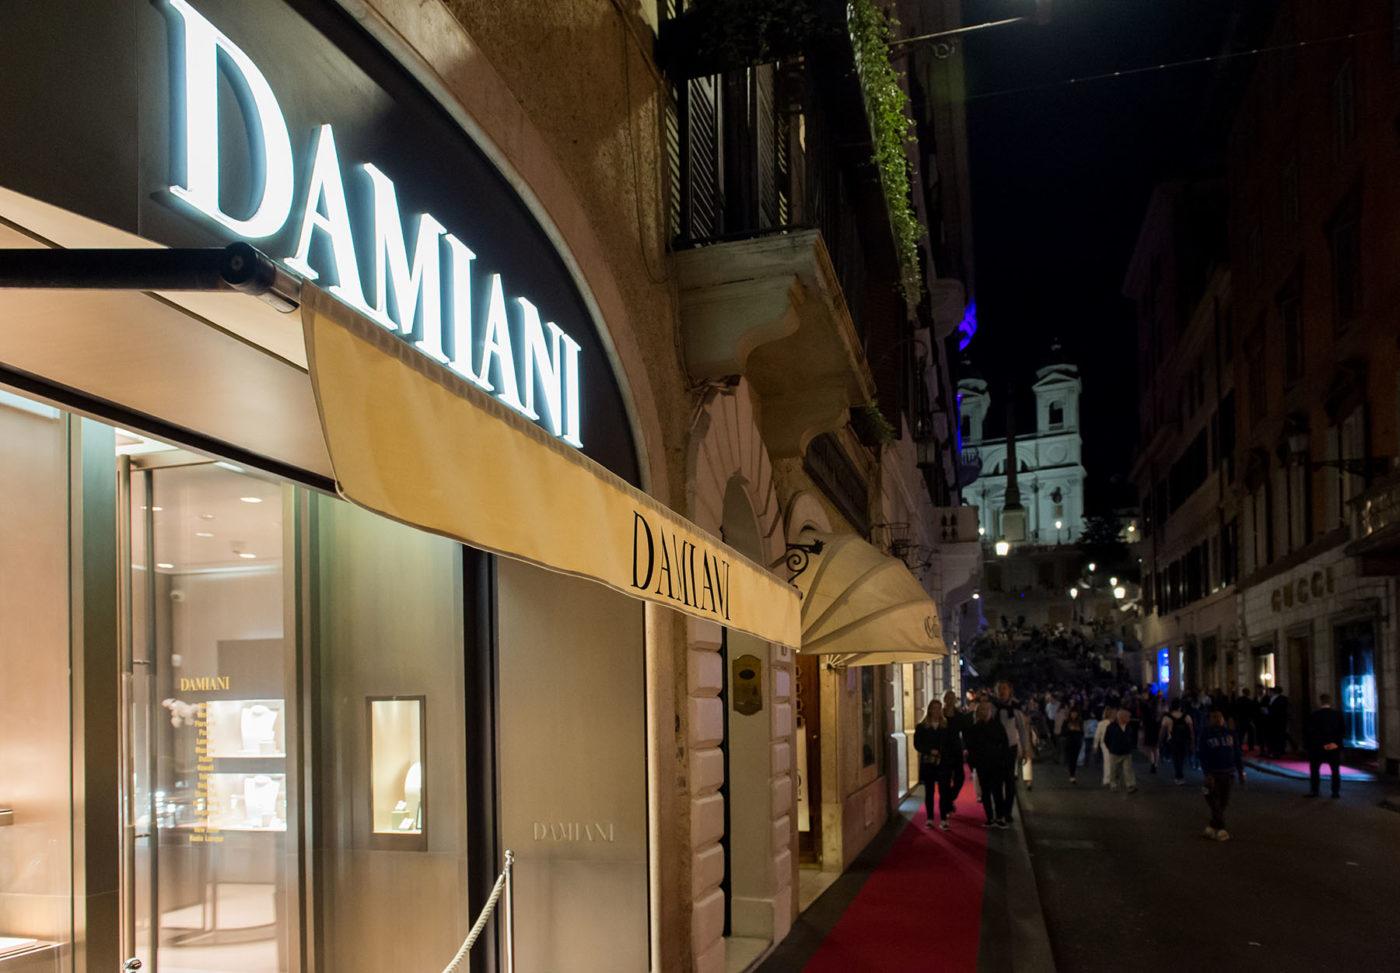 DamianiVendemmia-1